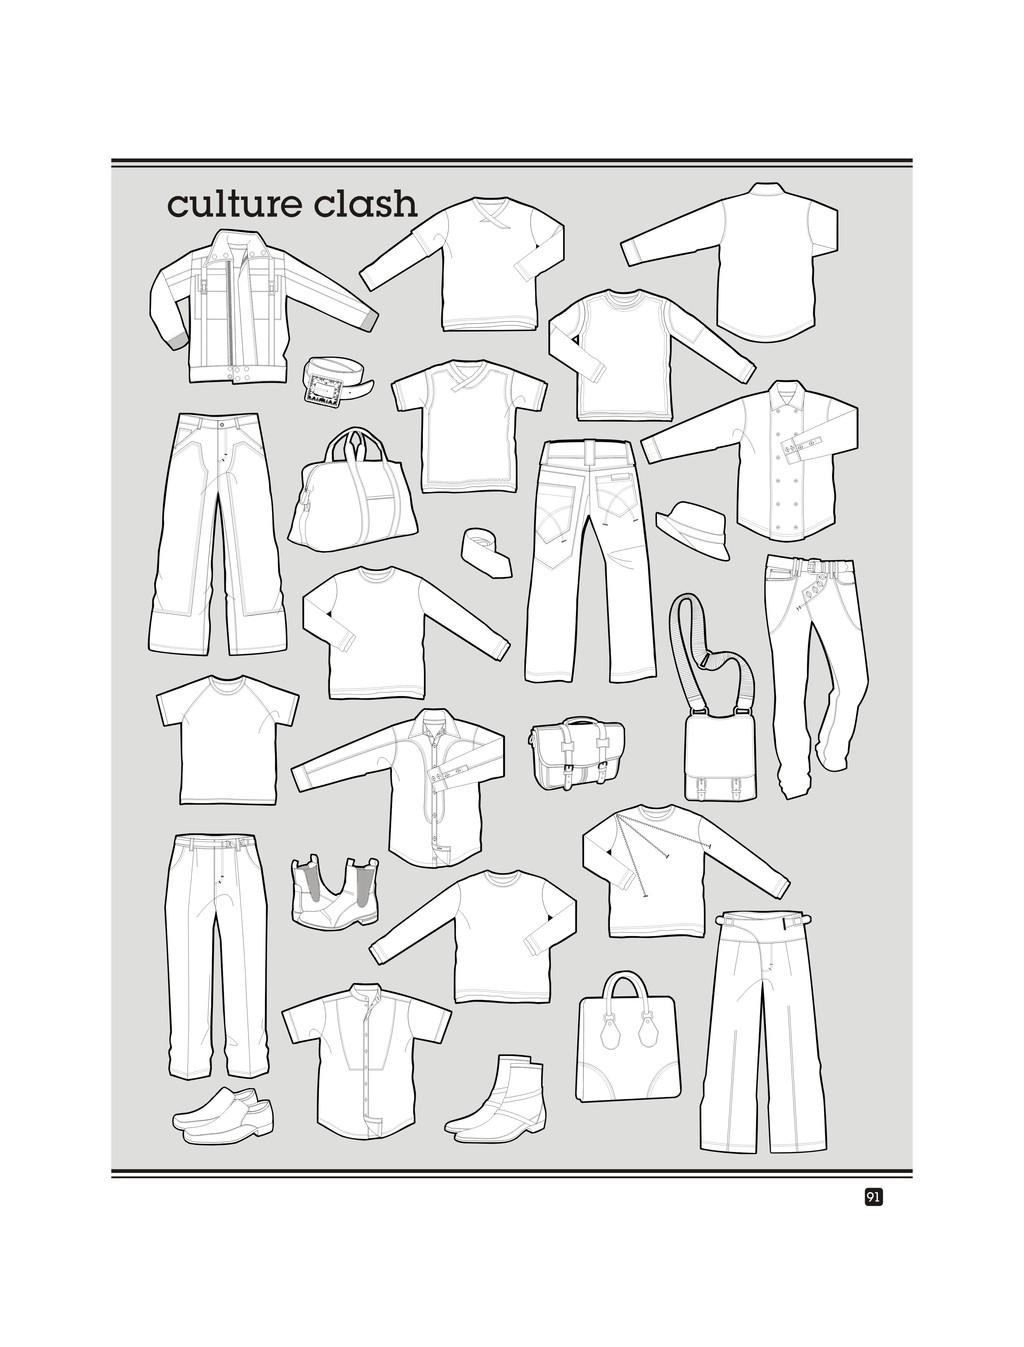 服装手绘图案 服装手绘图案 服装手绘图服装手绘图案 服装设计 服装